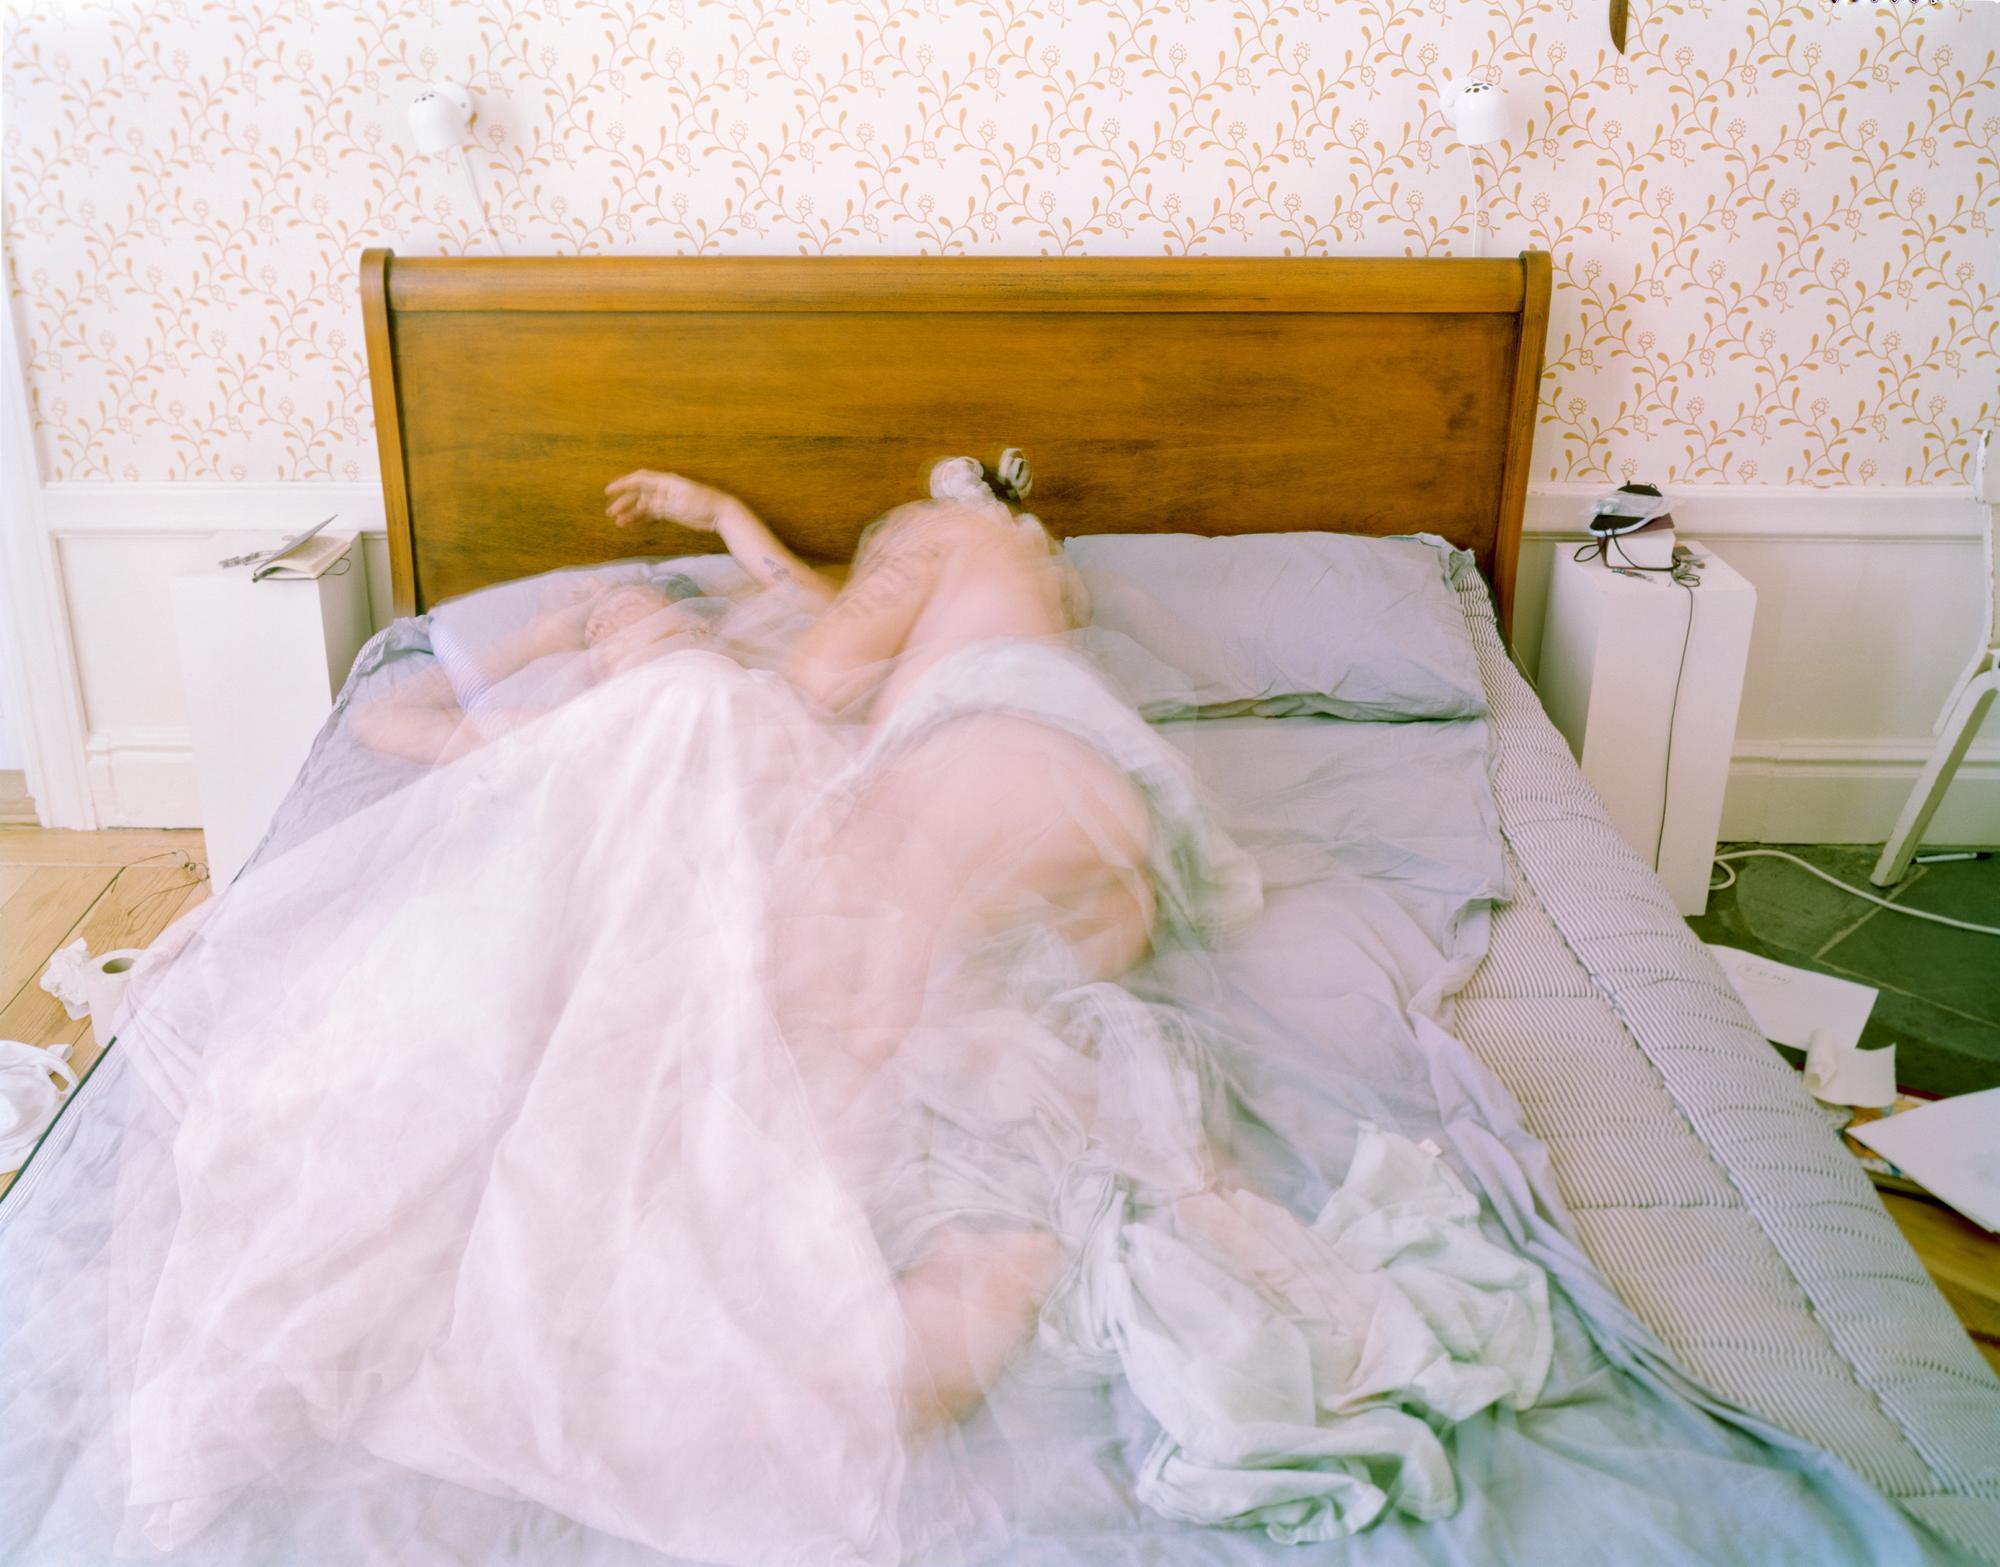 Long exposure figurative Photography: 'Illuminations No. #42'